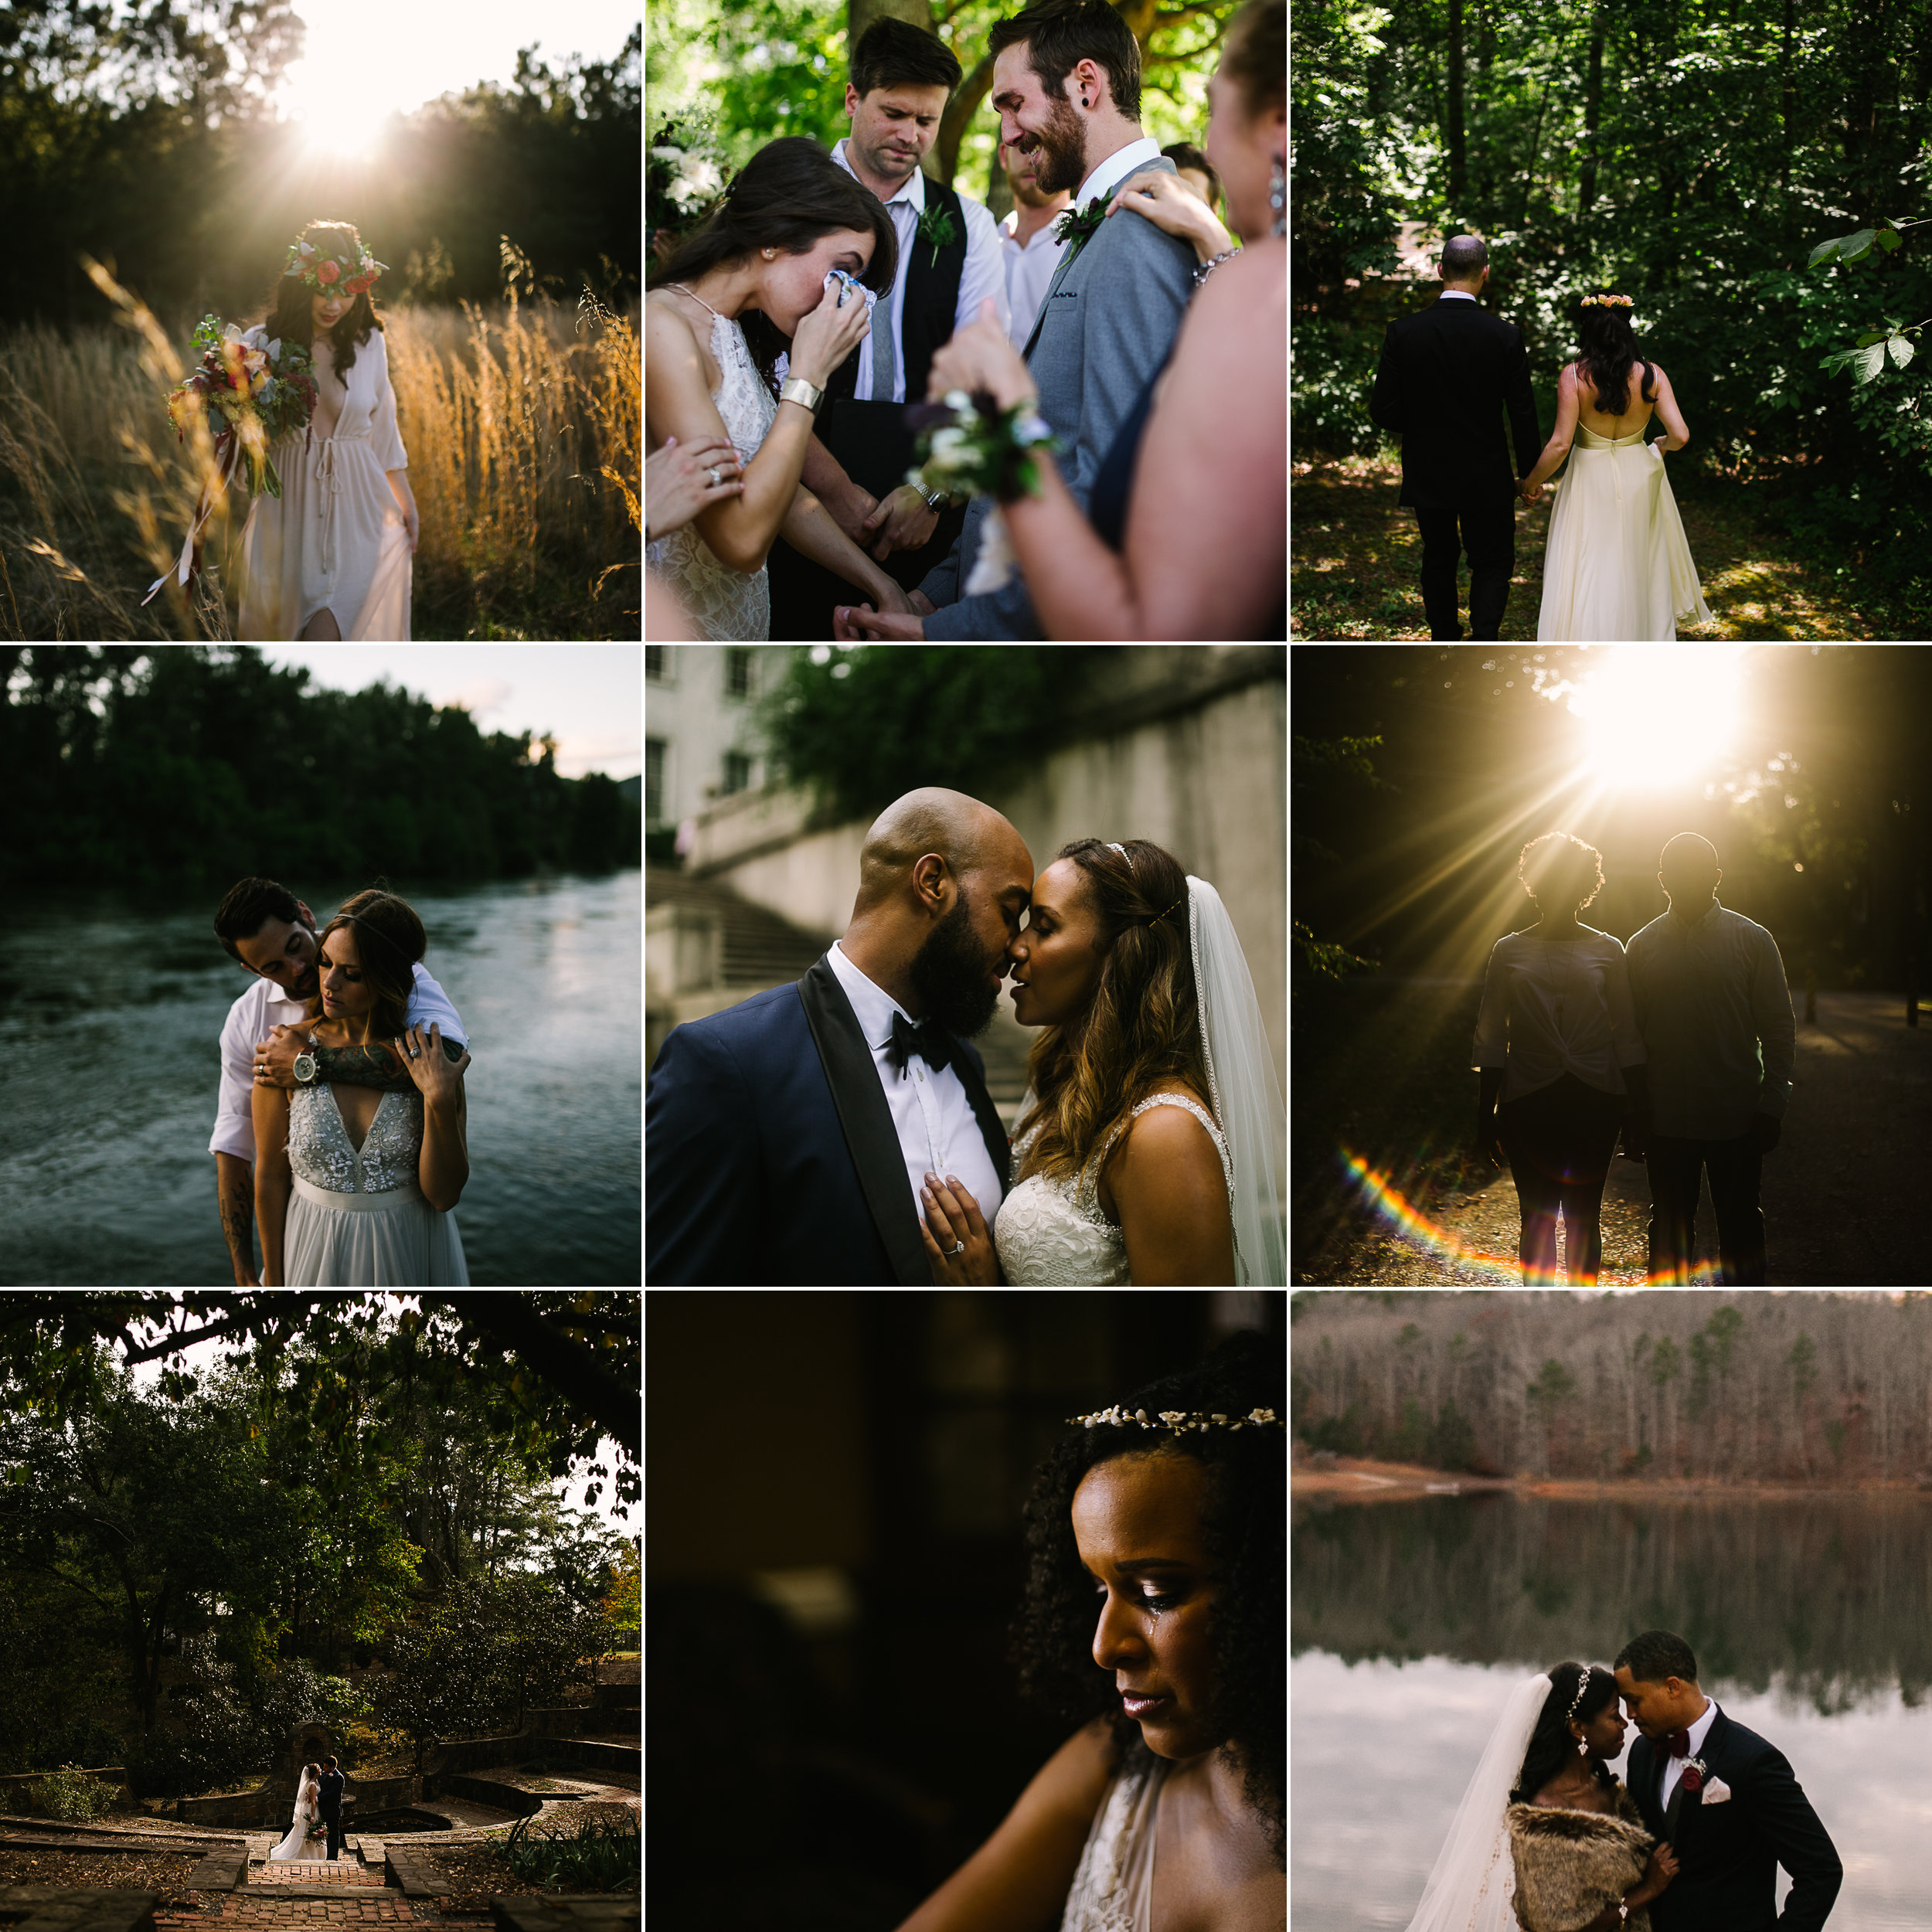 Best Atlanta wedding photographer of 2016